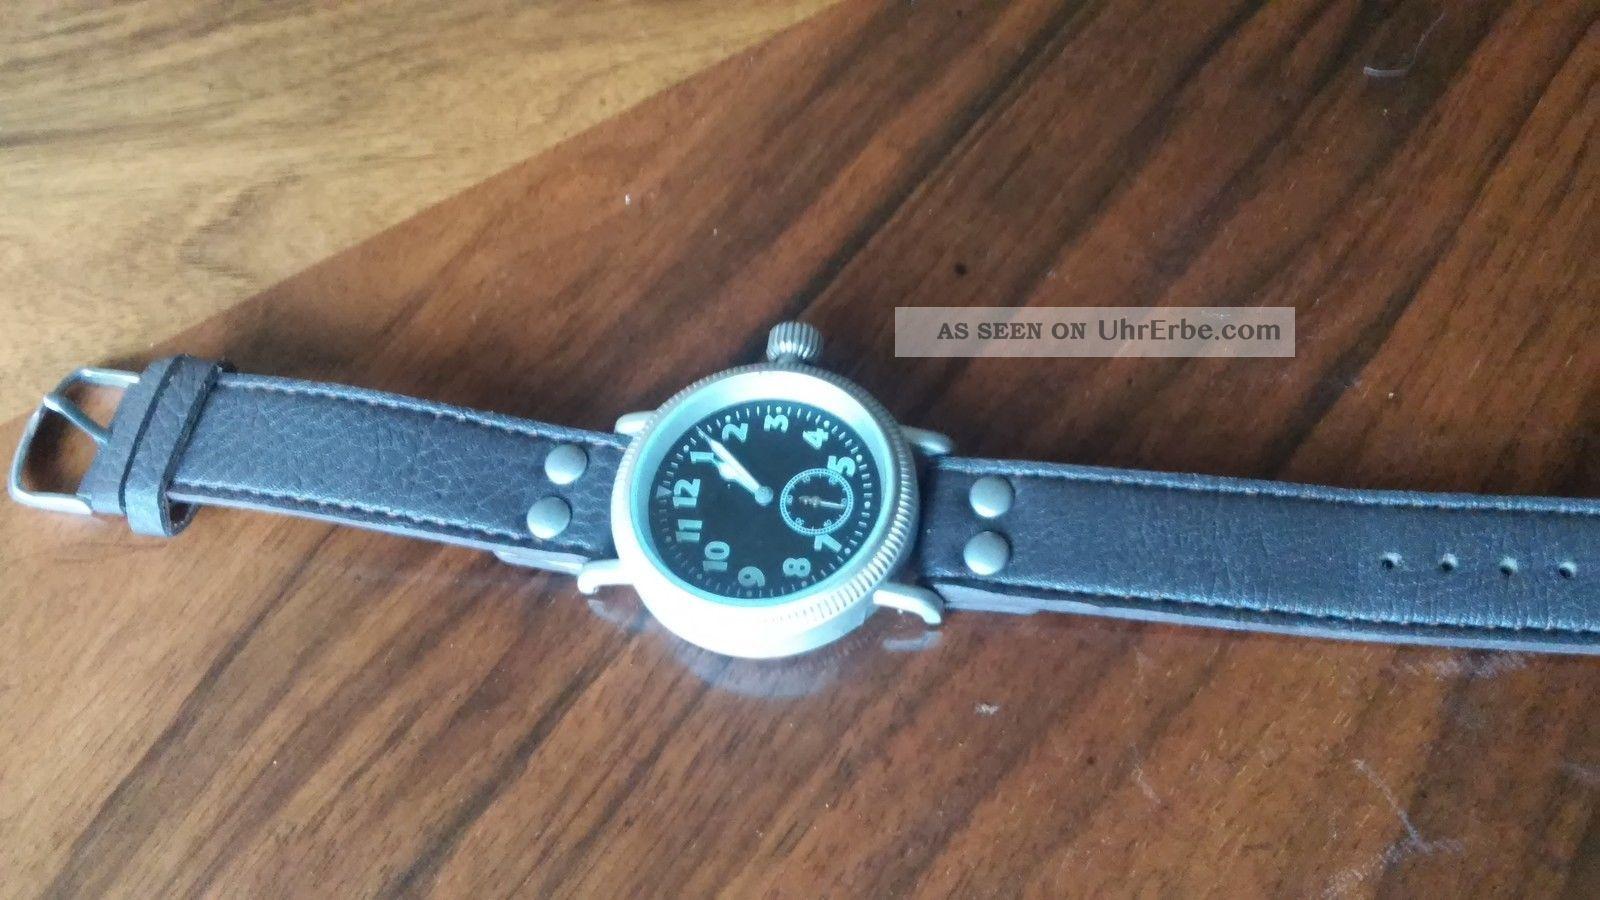 Fliegeruhr Replika Handaufzug Armbanduhren Bild